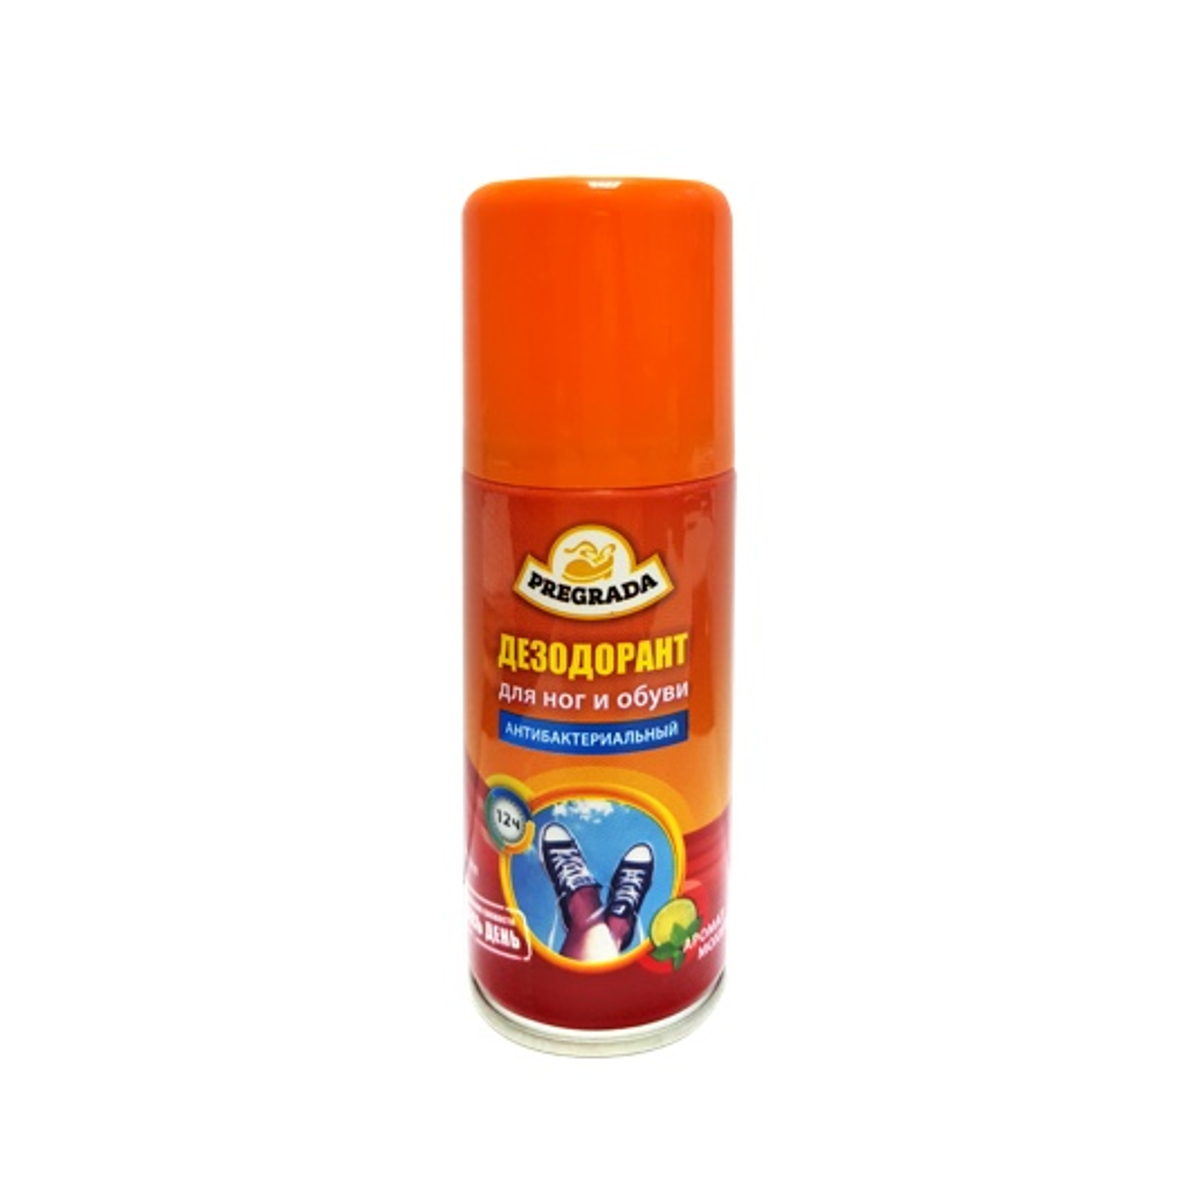 Аэрозоль дезодорант Pregrada Защита от запаха, для ног и обуви, 100 мл